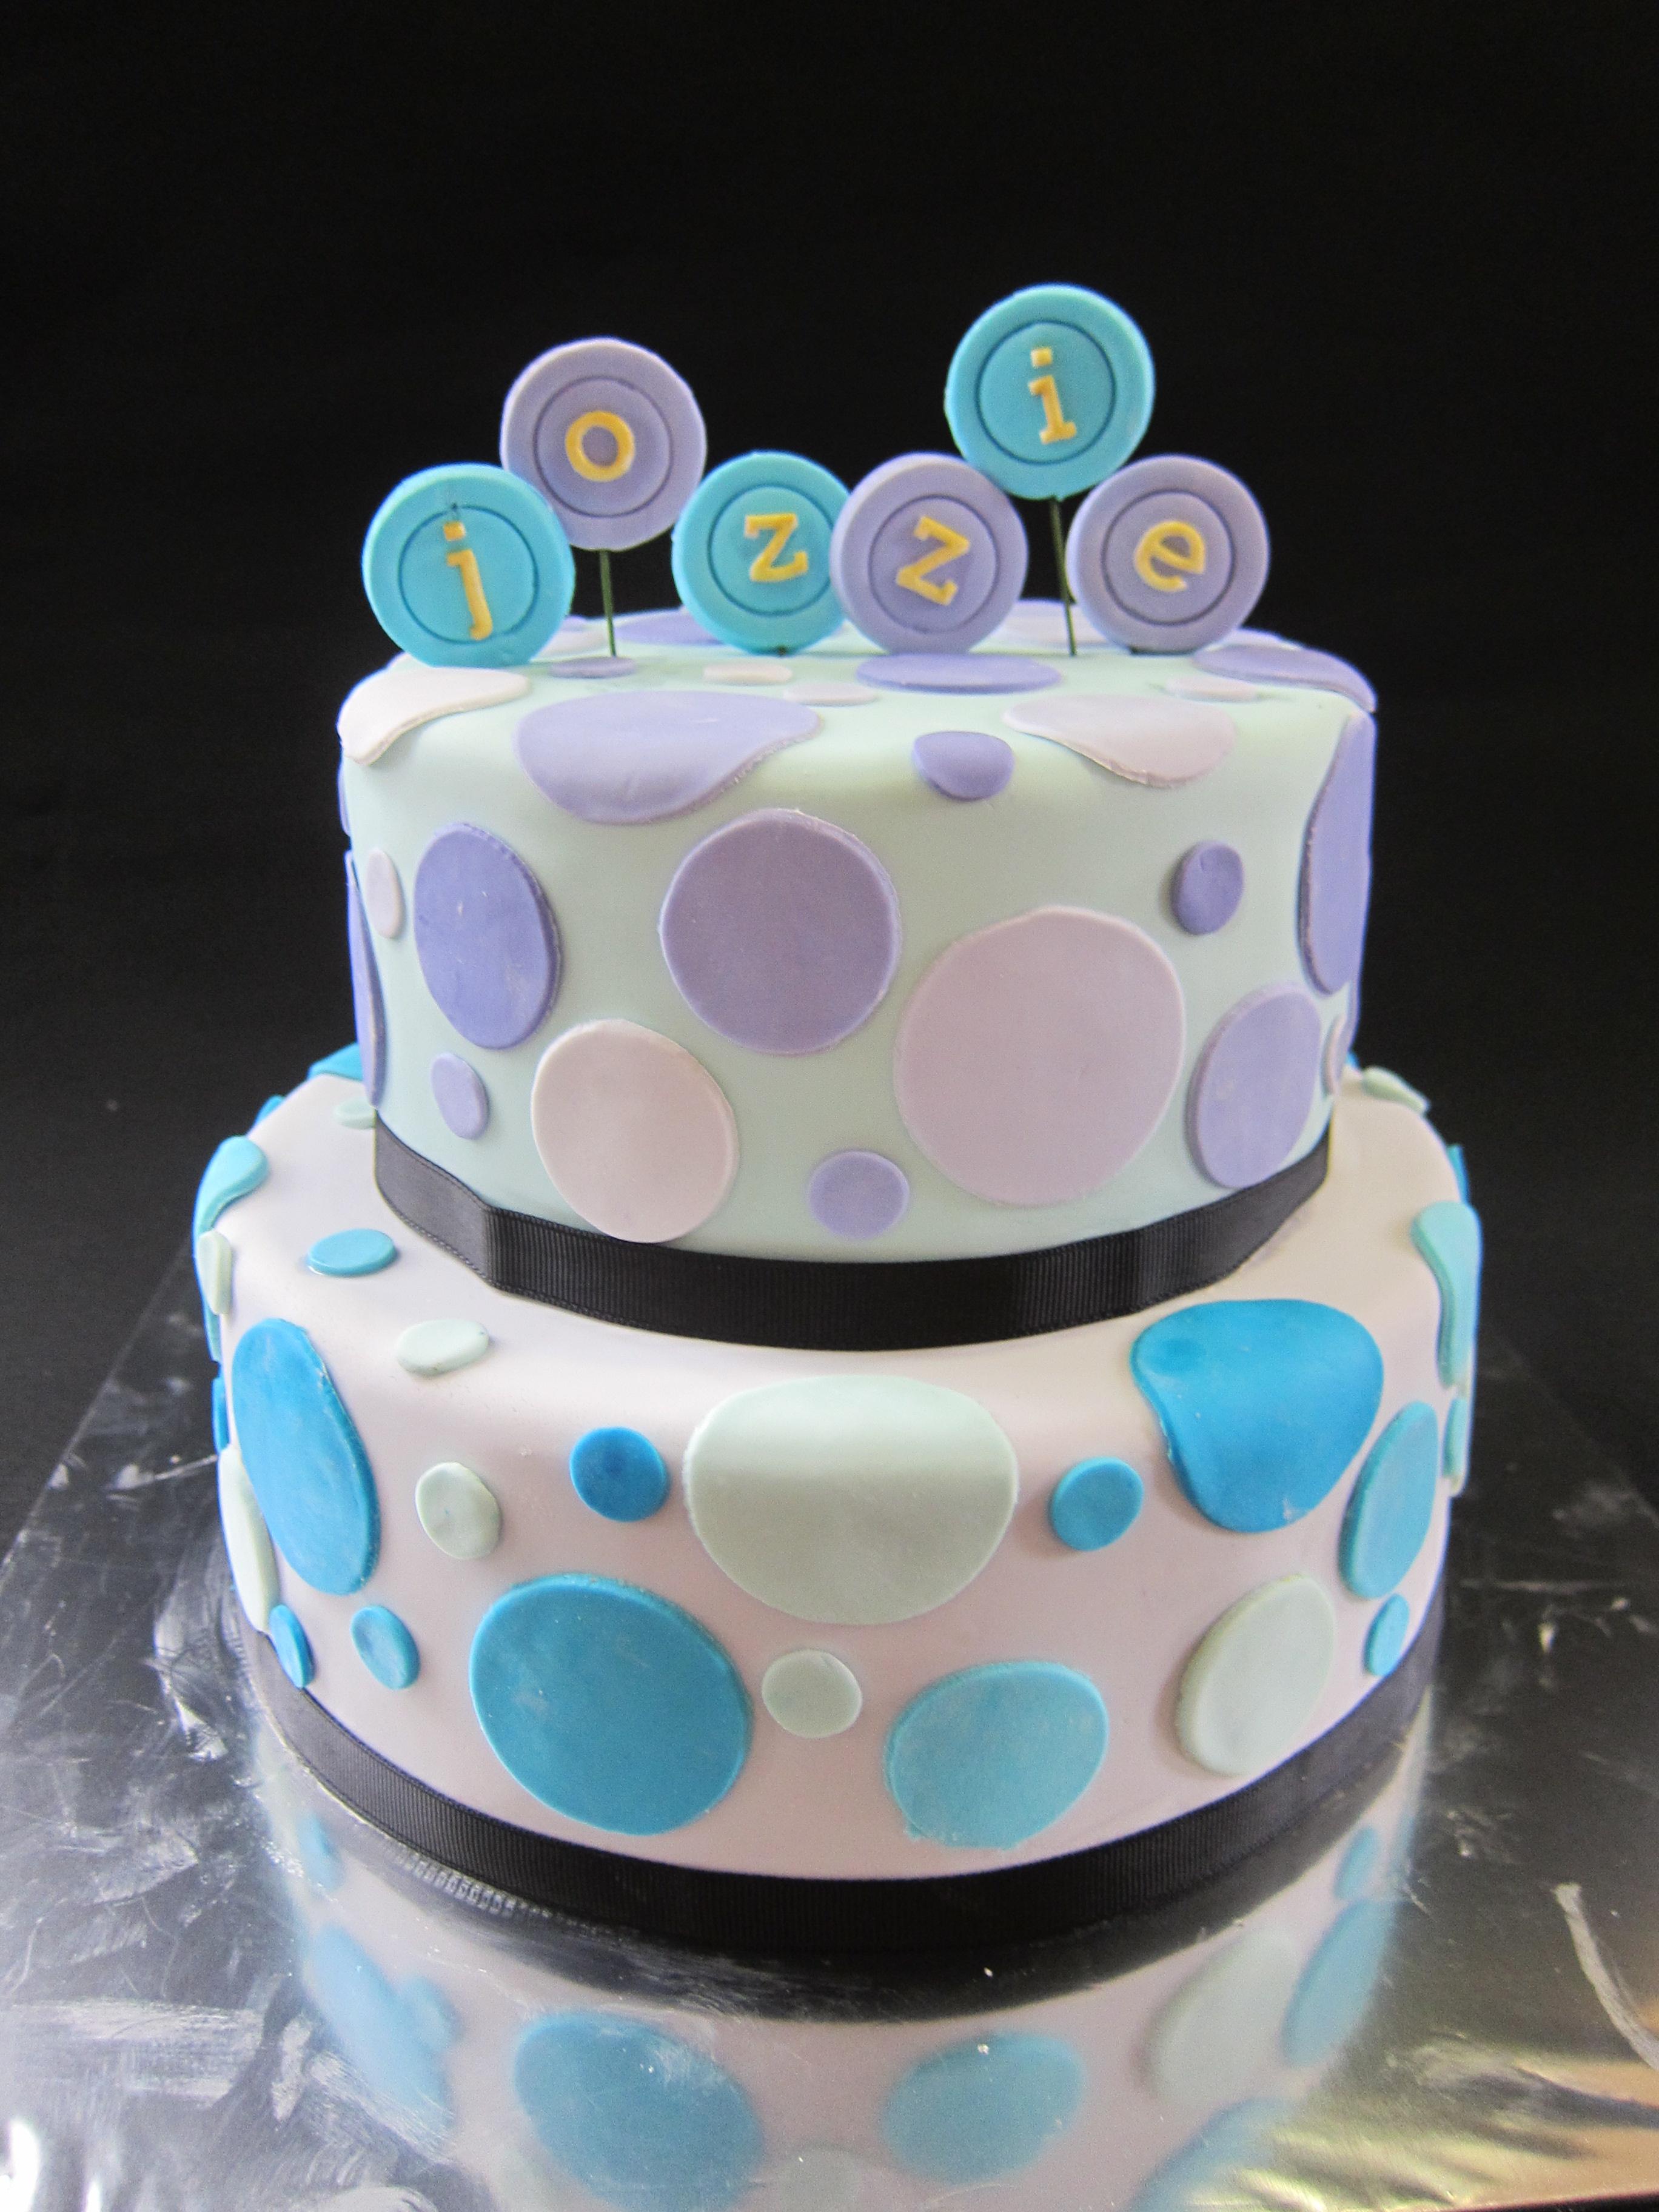 Cake Design Pics : Polka Dotted Cake